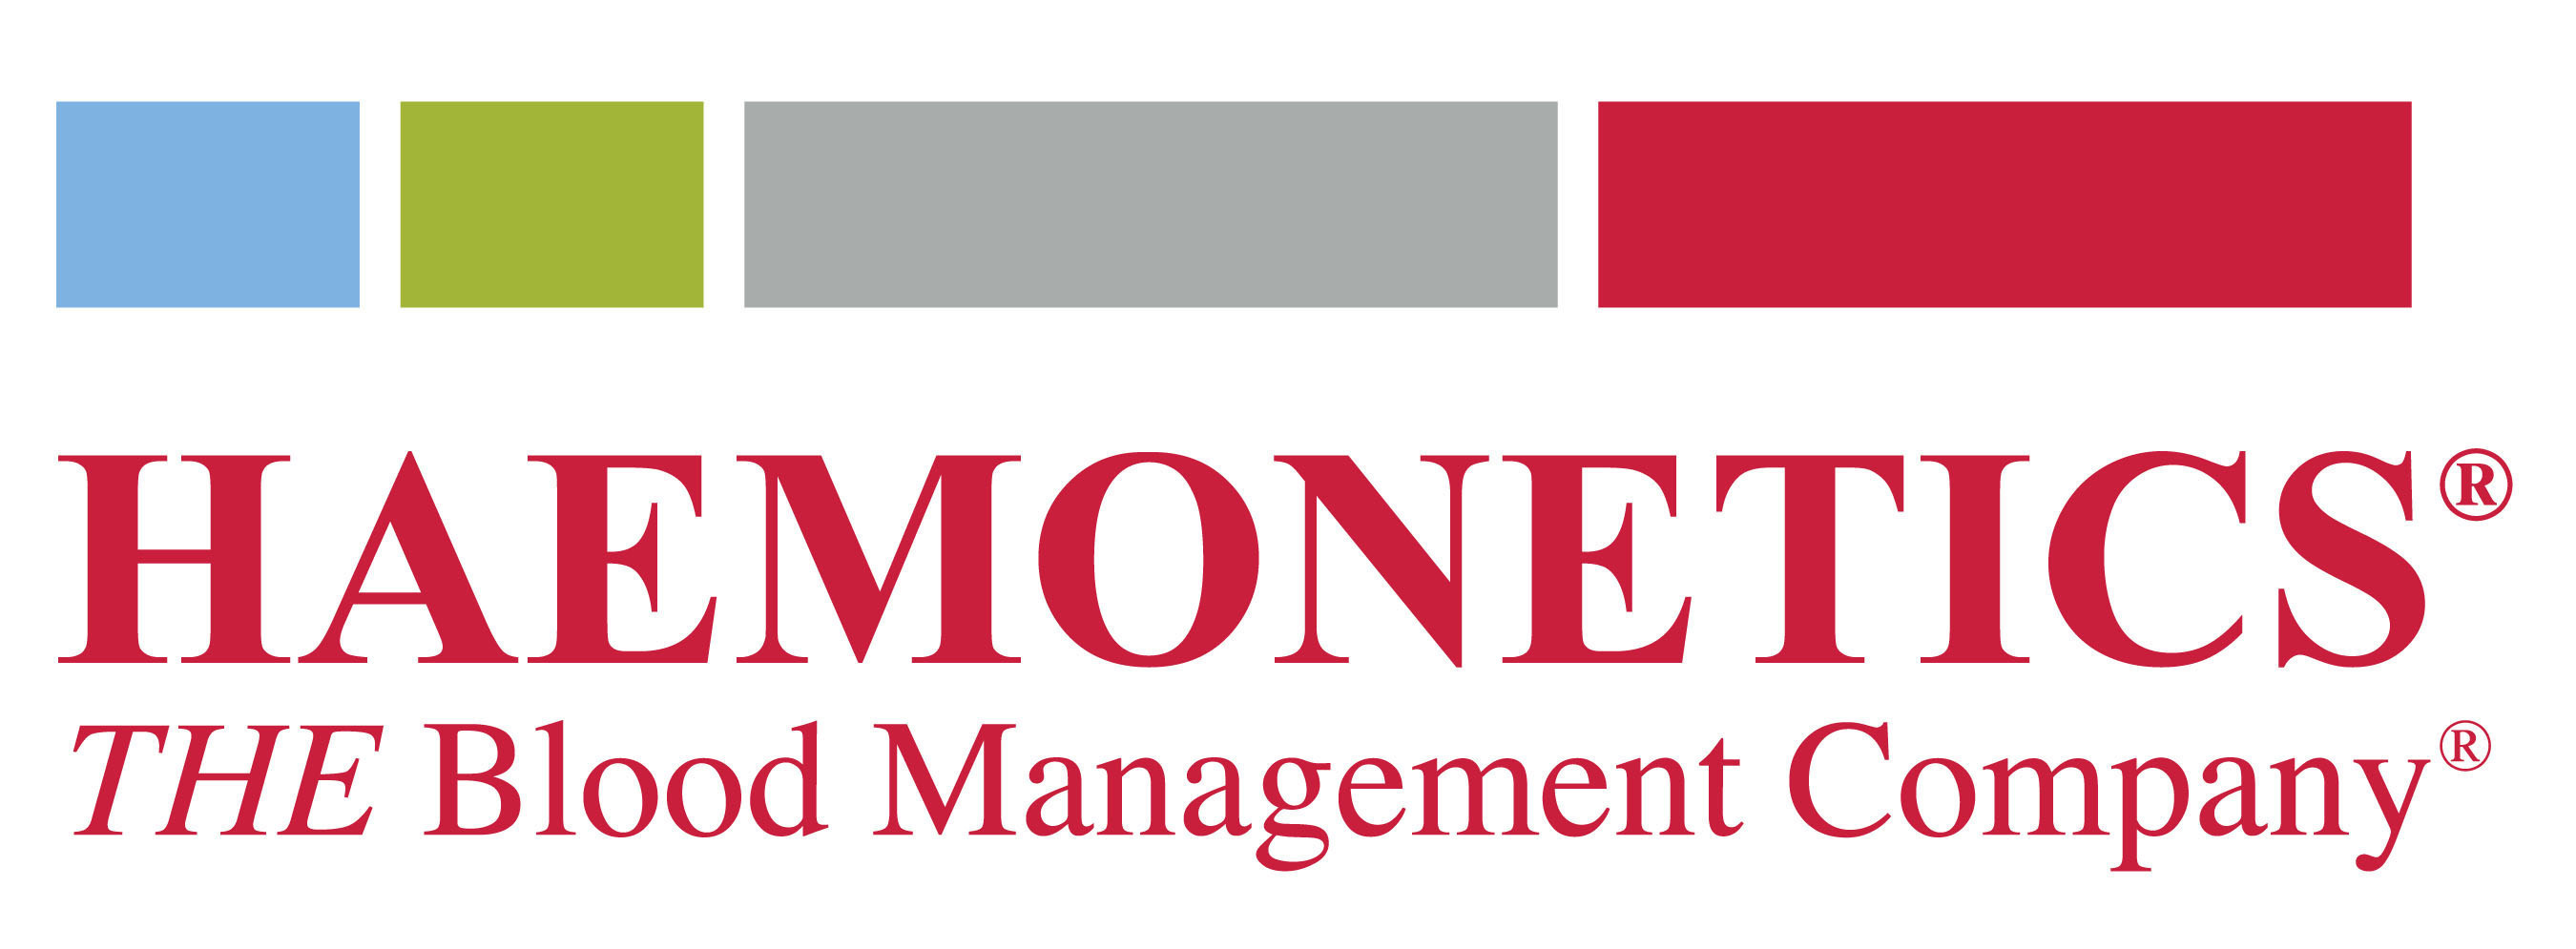 Haemonetics Corporation logo